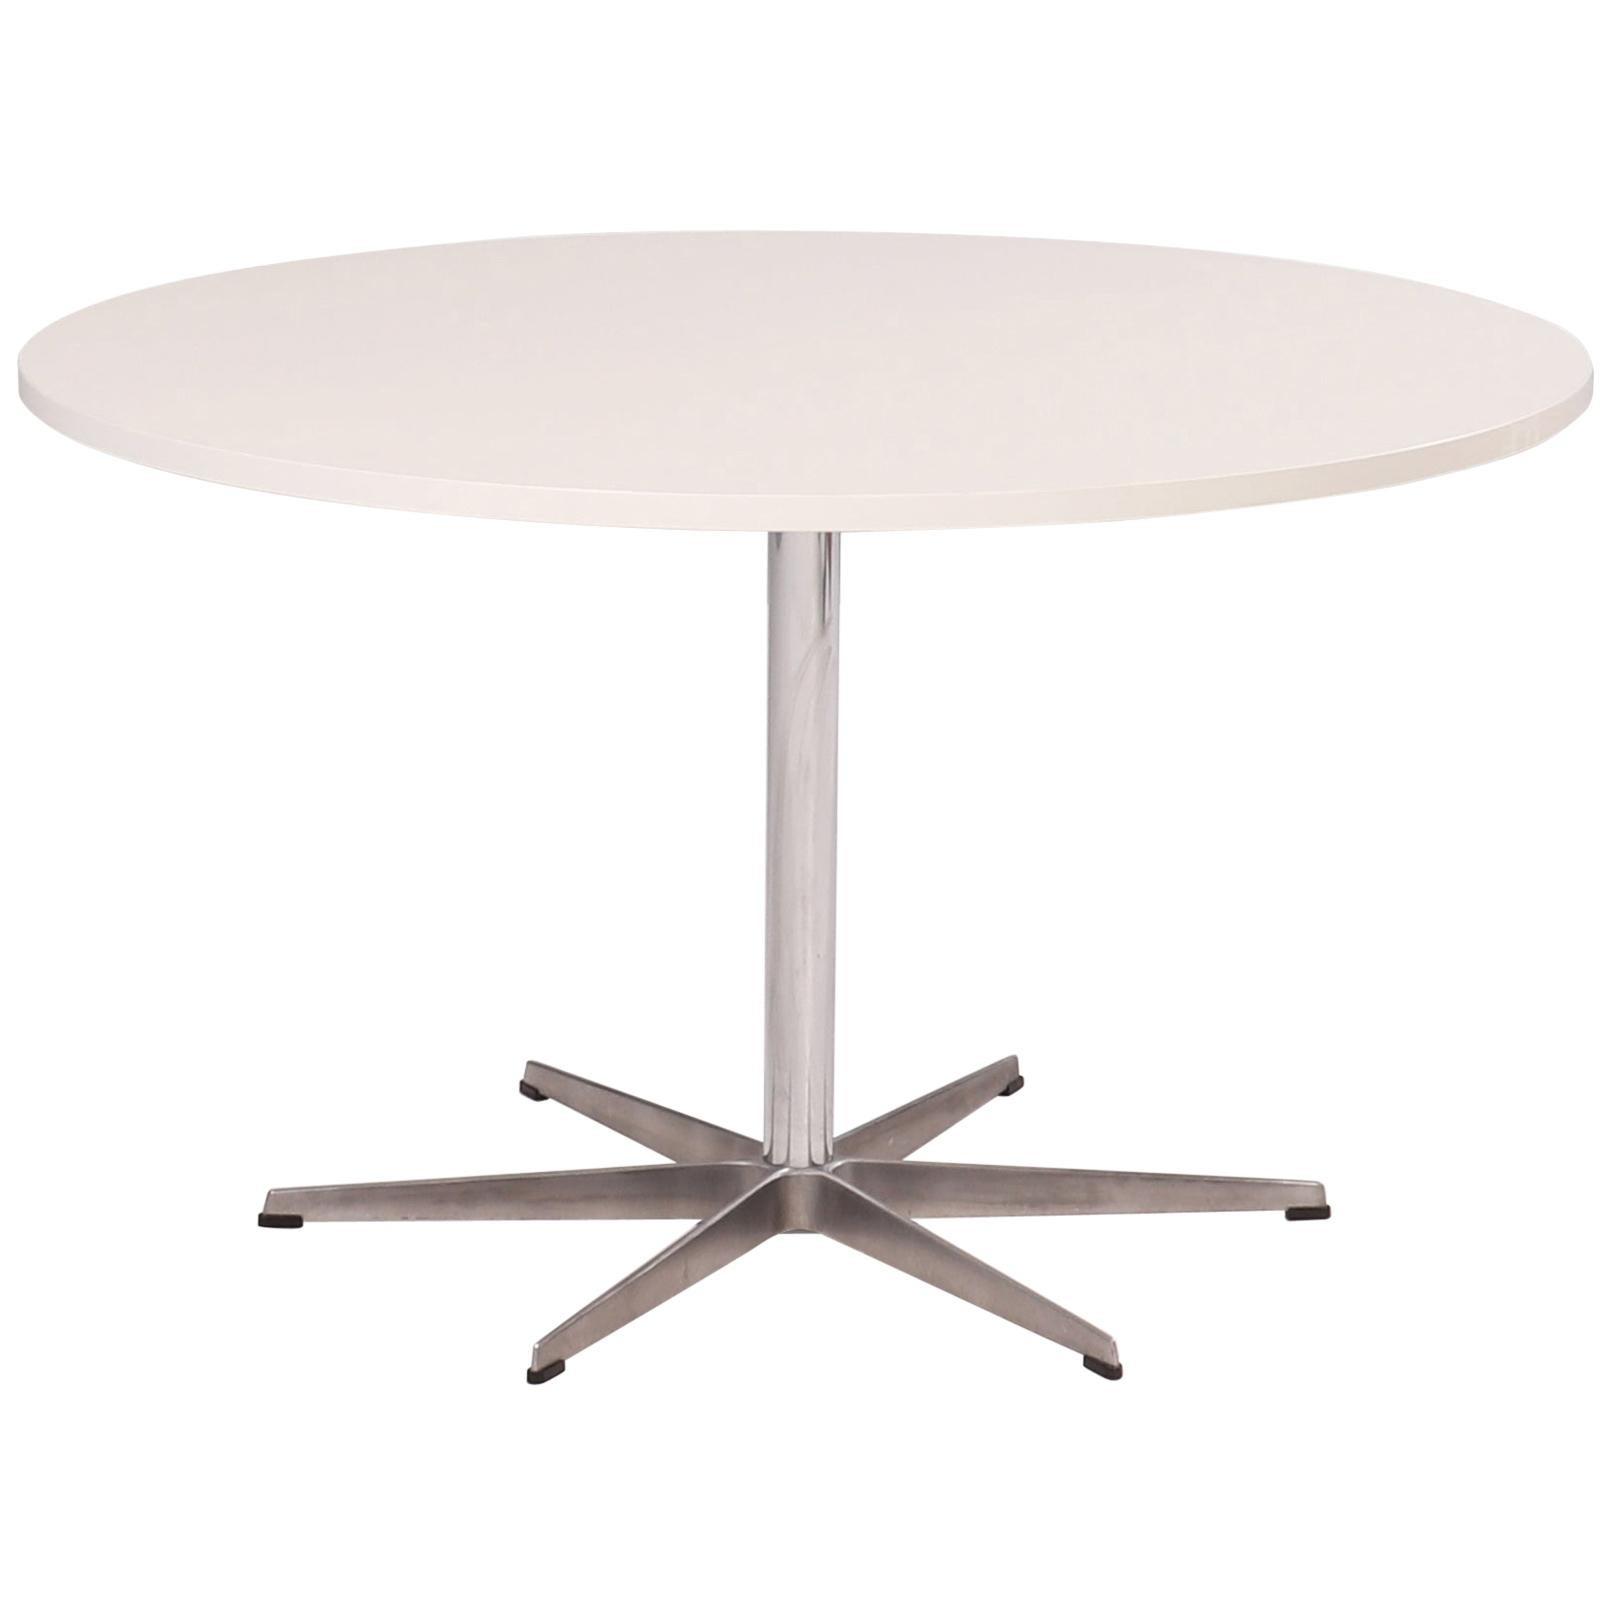 Fritz Hansen by Arne Jacobsen Circular White Dining Table